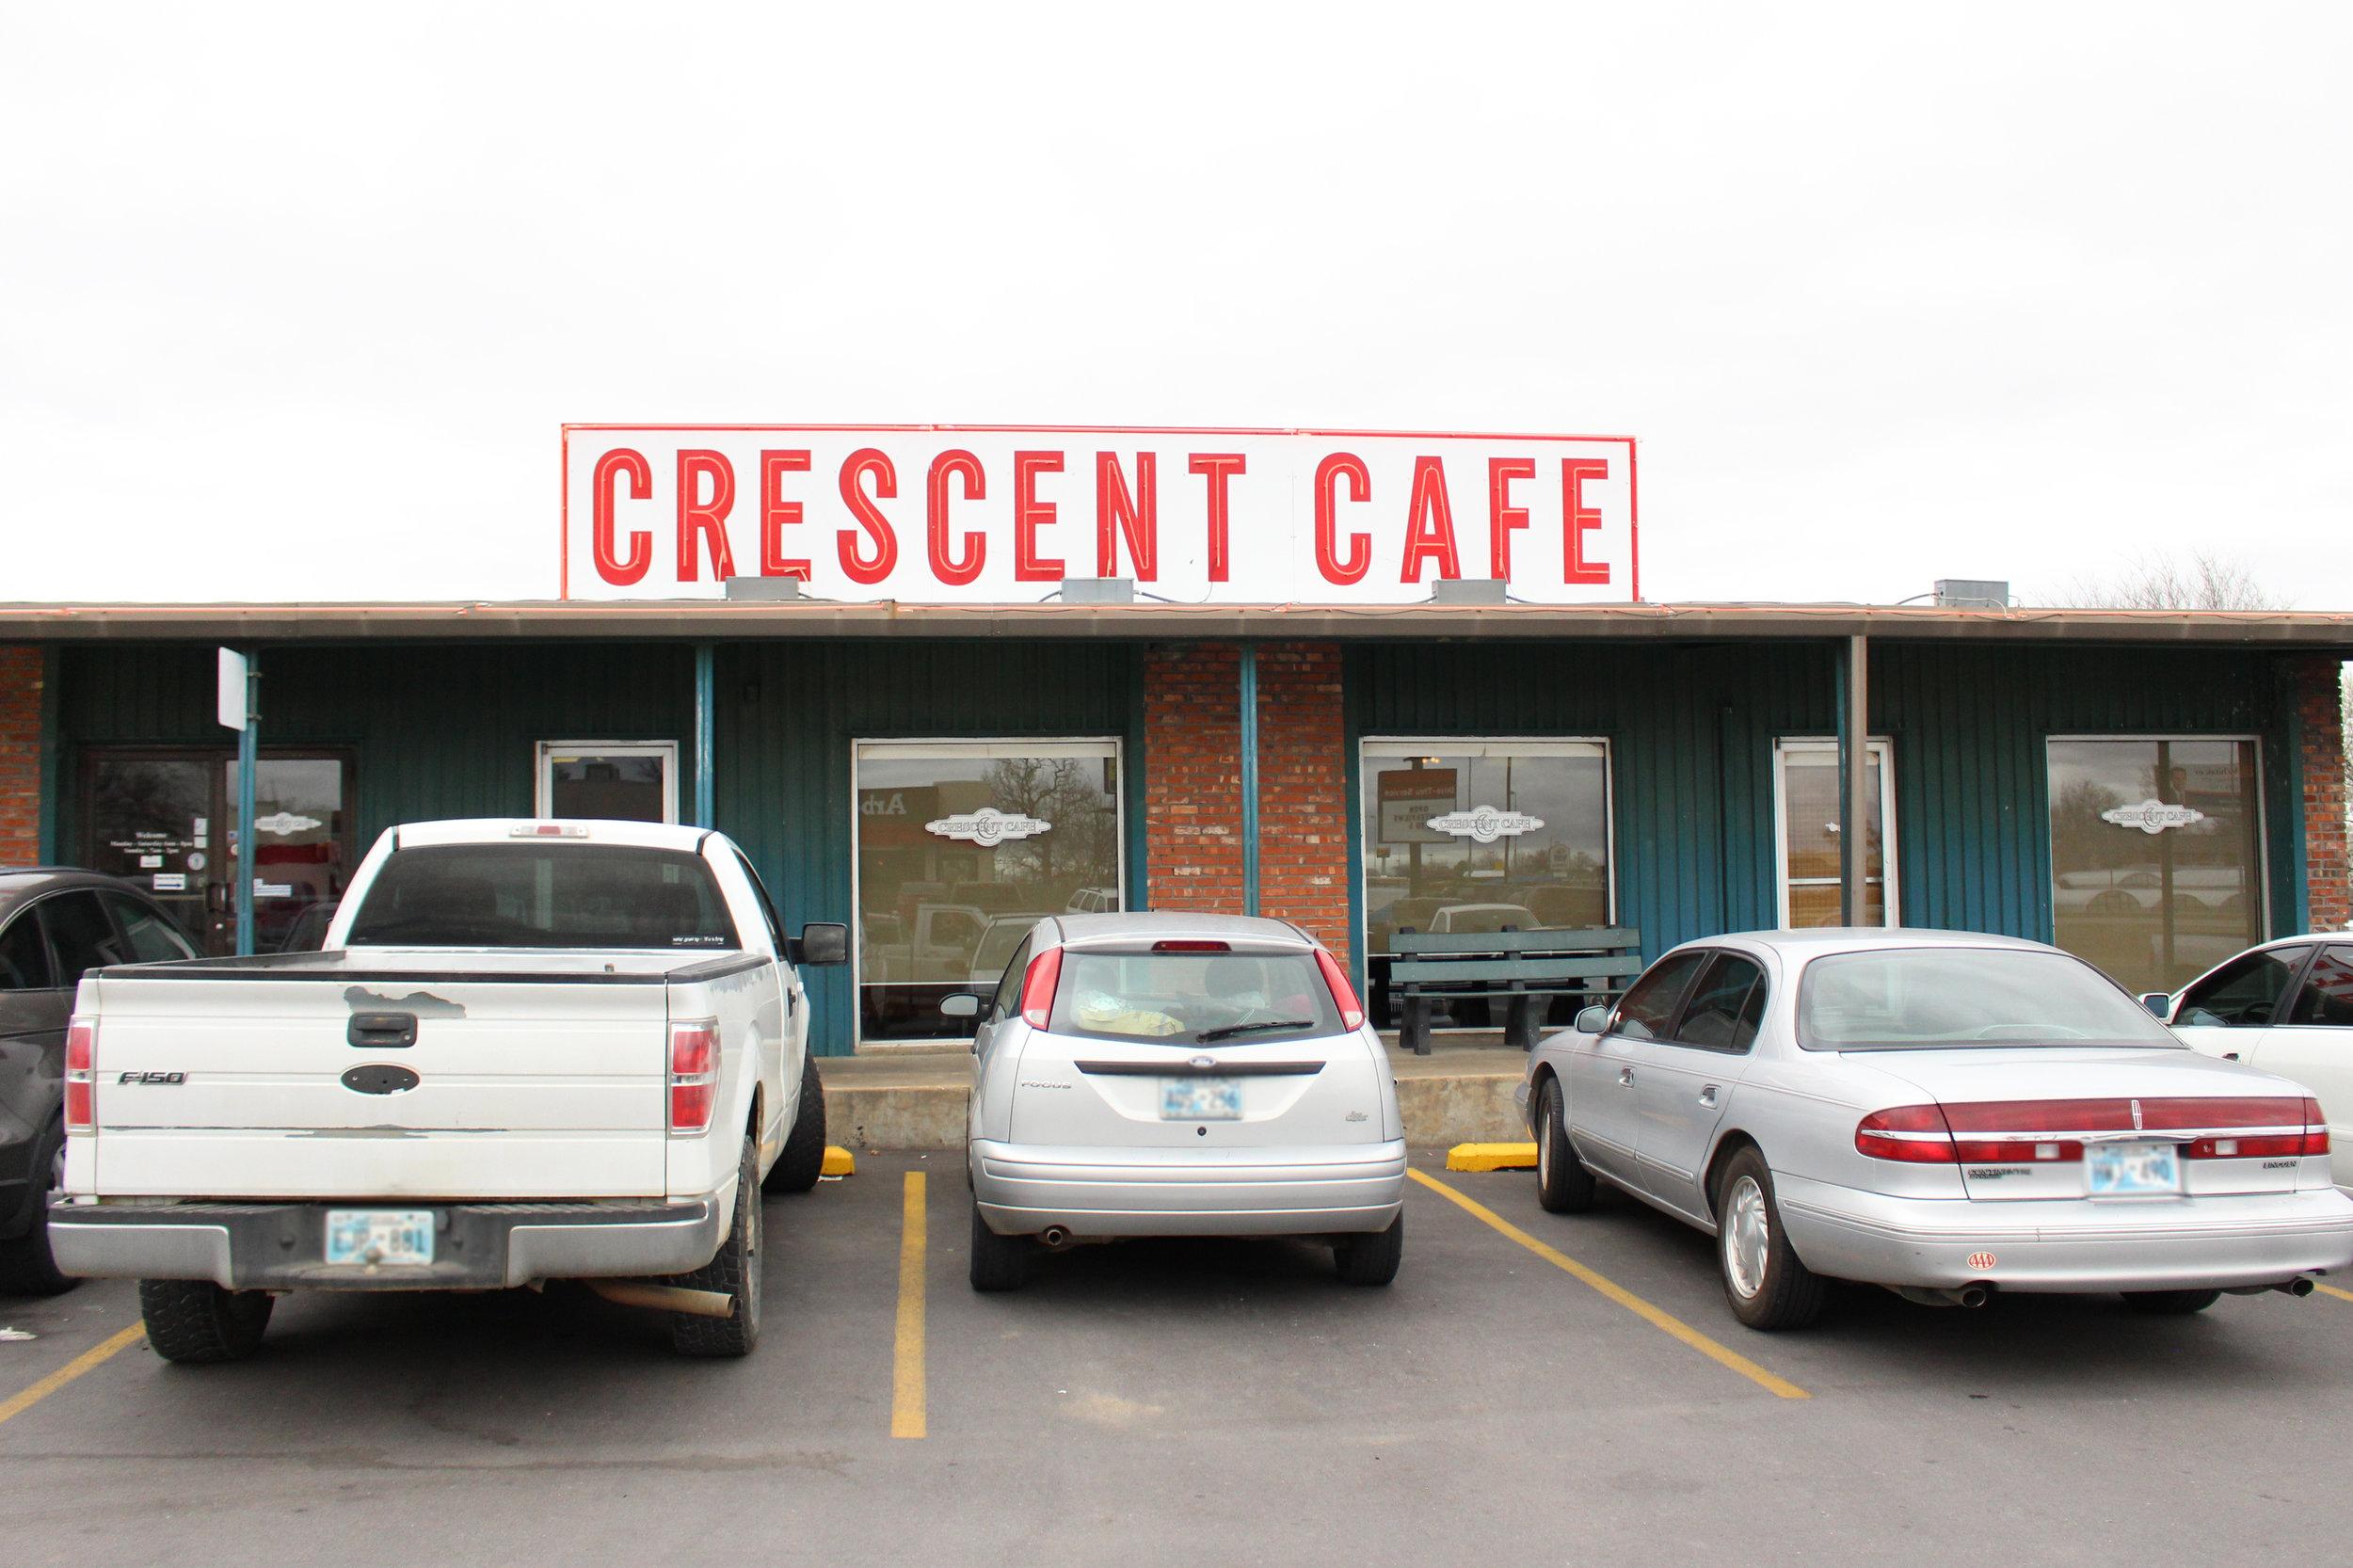 crescent cafe - prattville 3417 south 113th west avenue